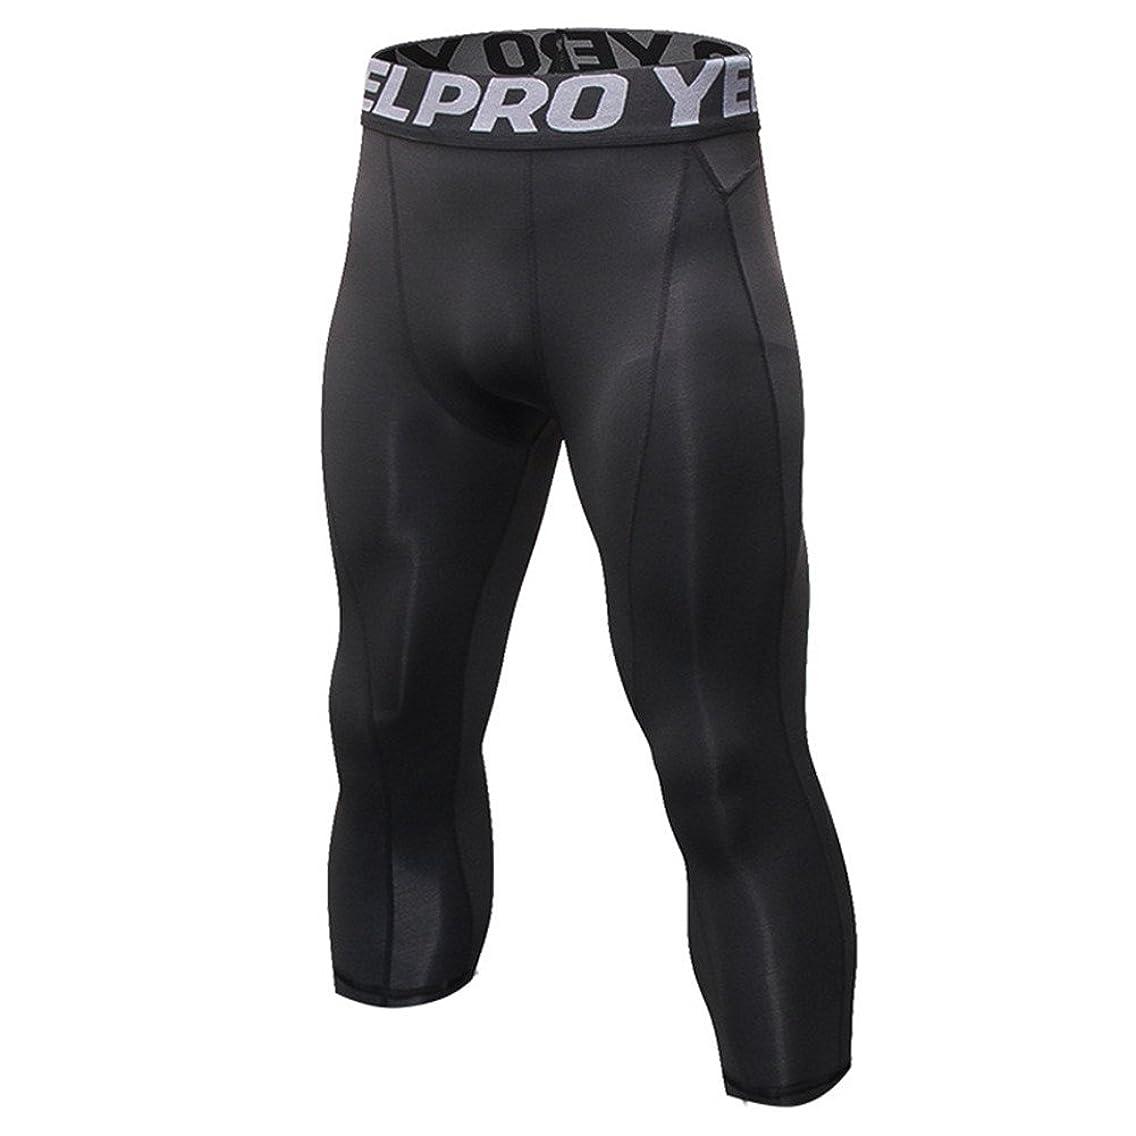 Sanke Mens Athletic Capri Legging Cool Dry Compression Running Tights 3/4Pants